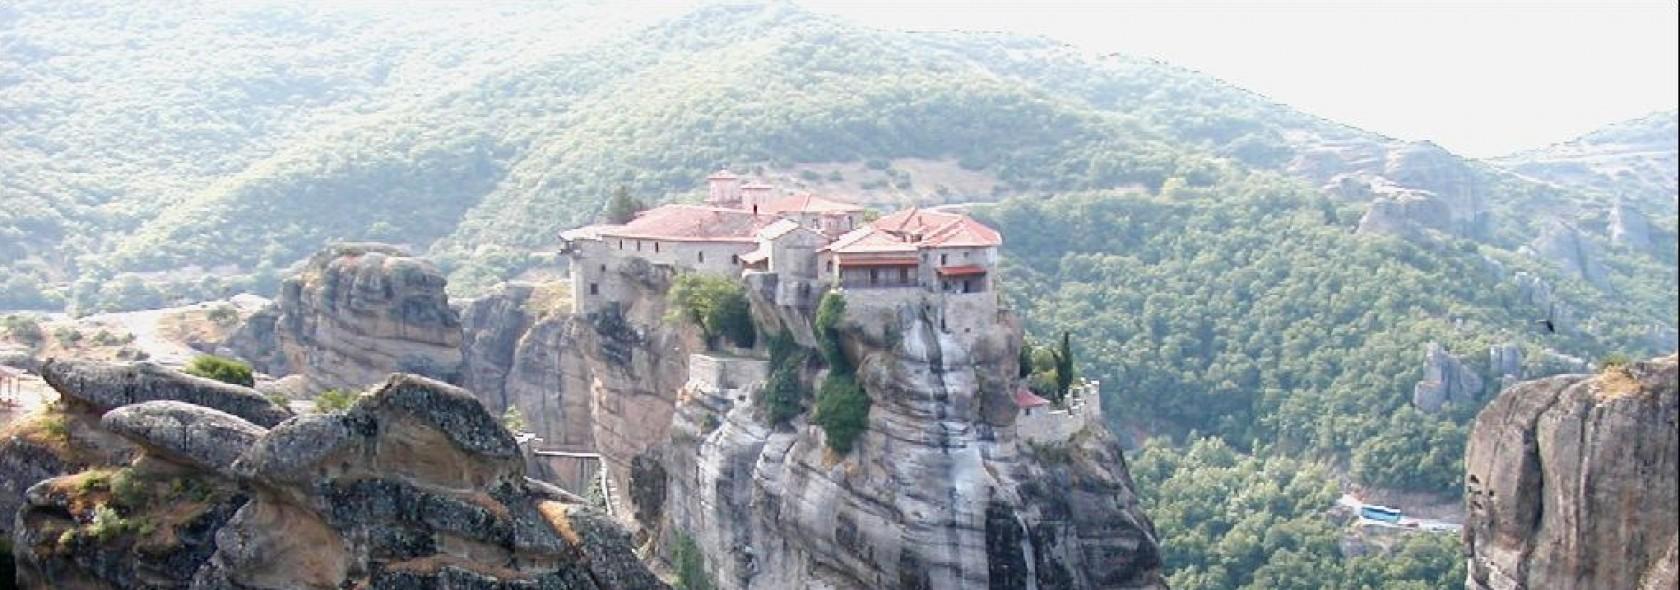 Meteore Monasteri - Grecia